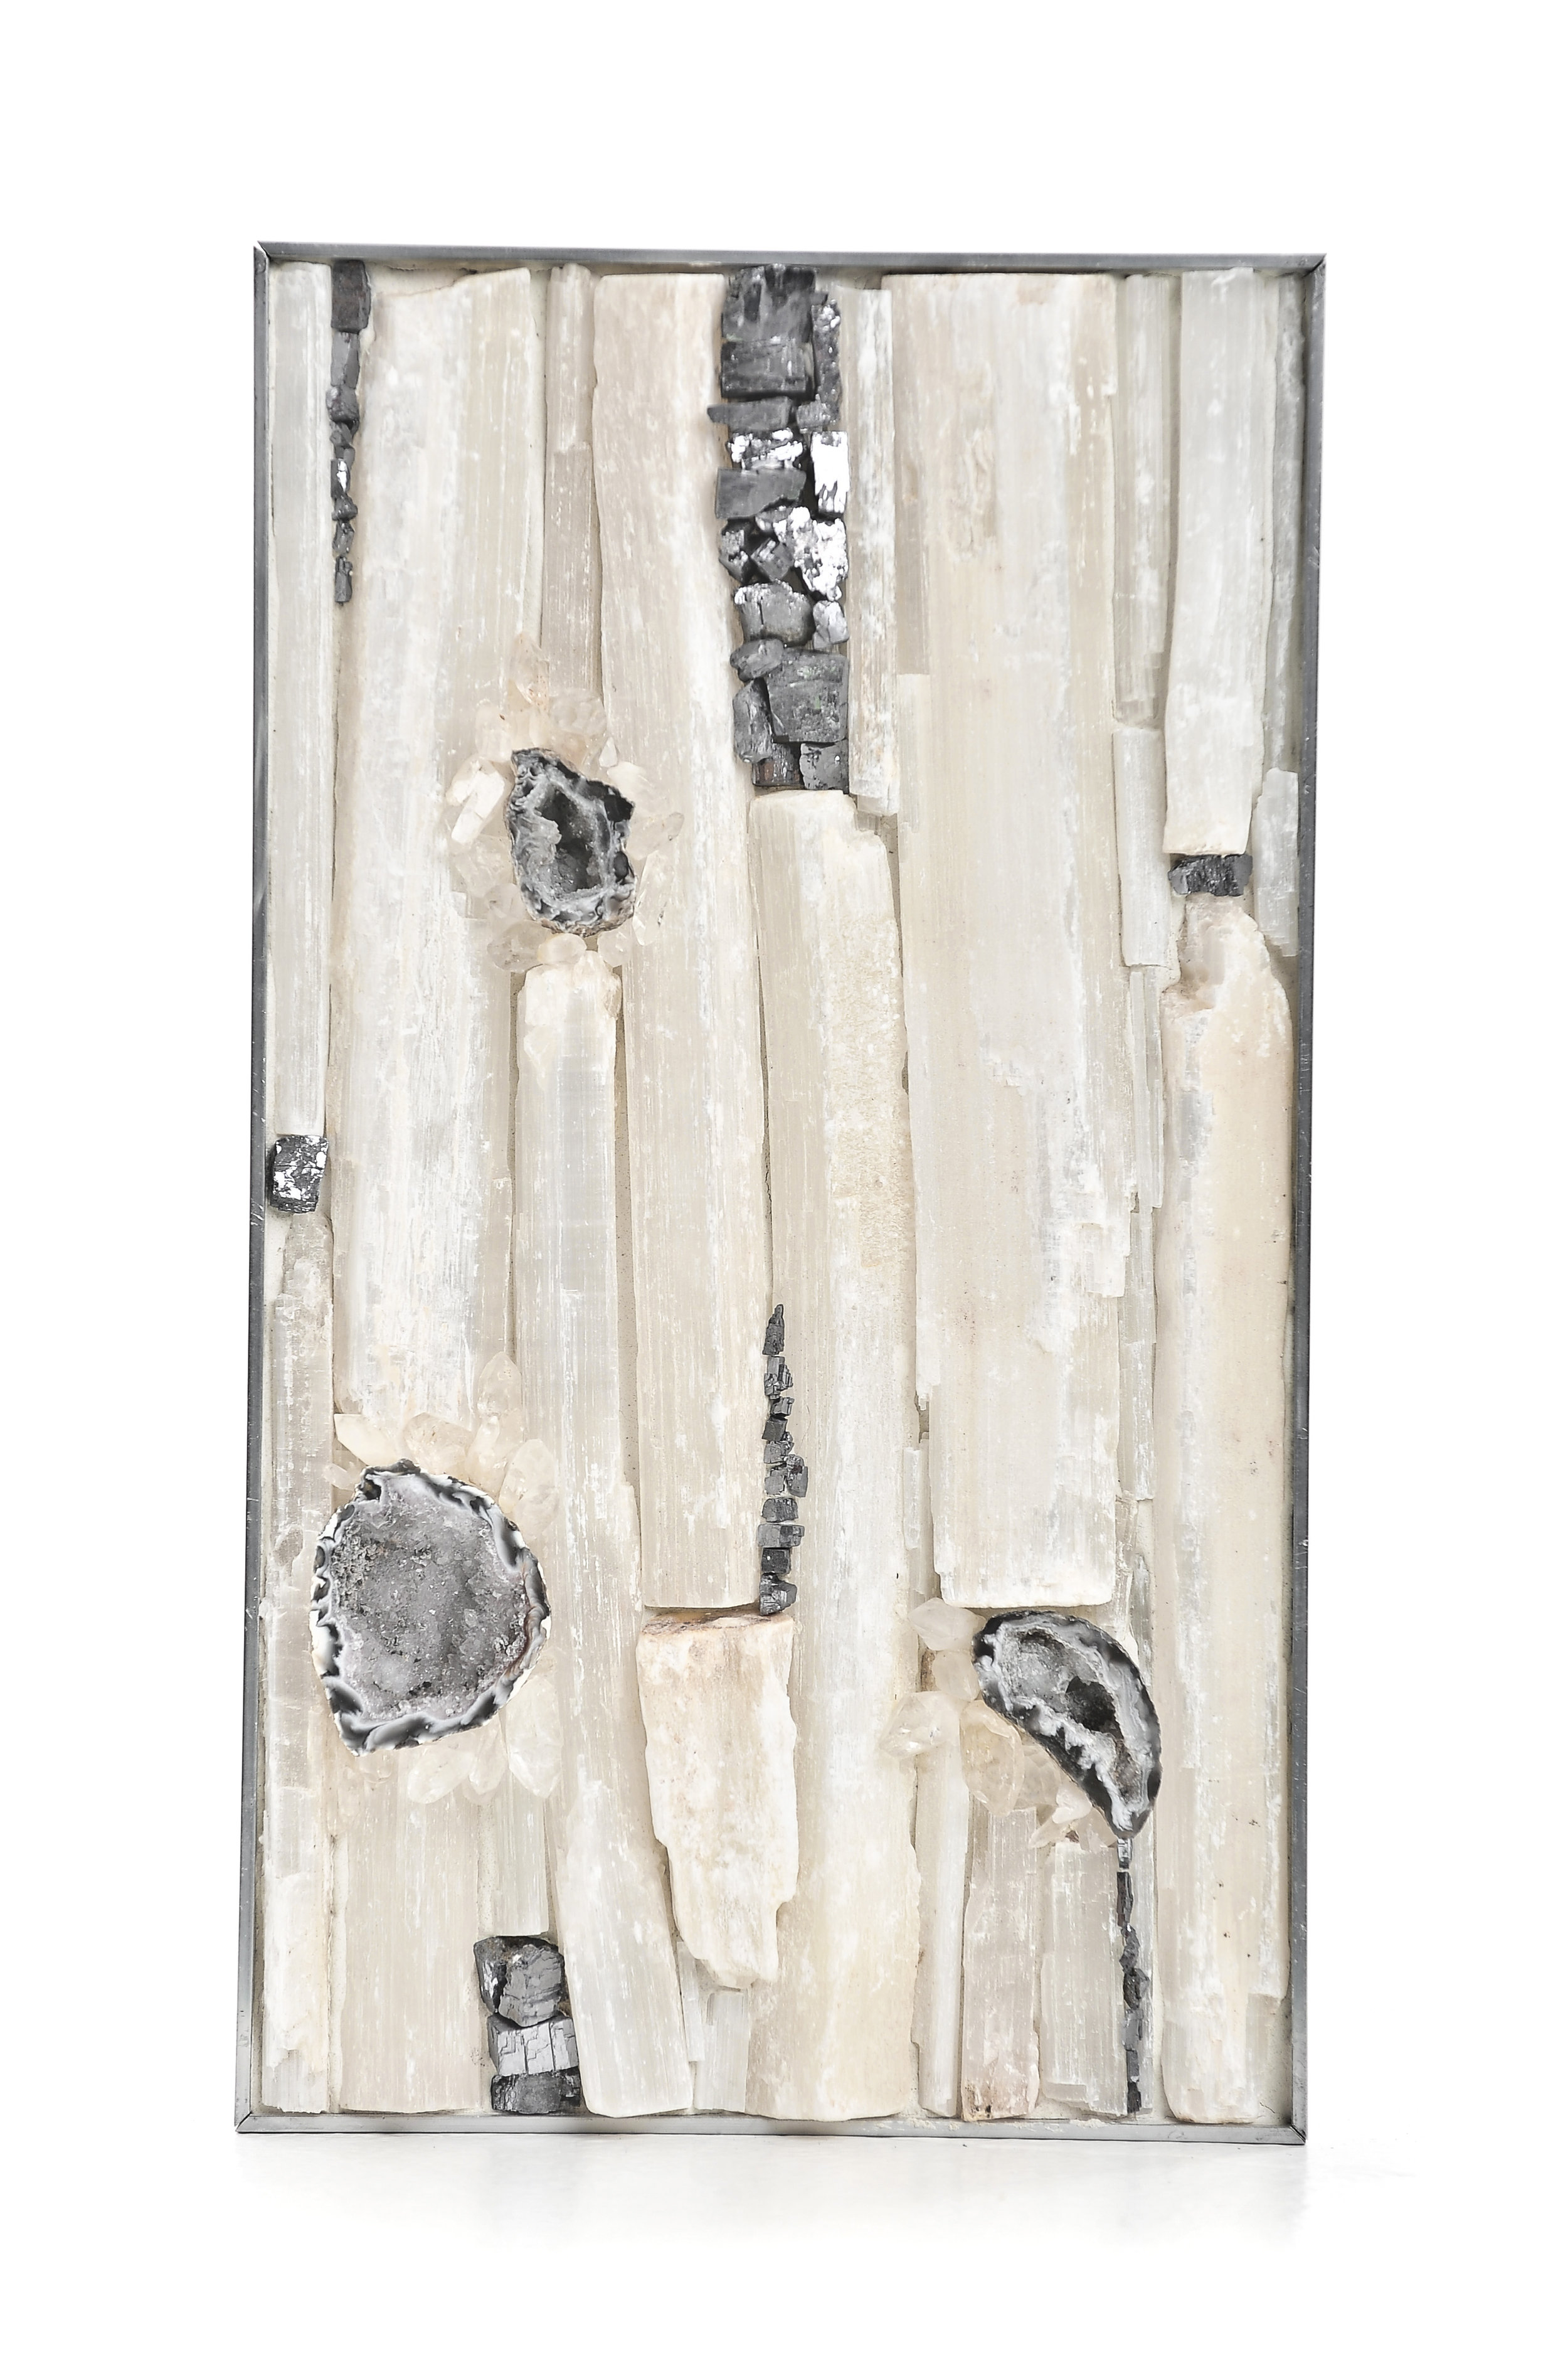 Sticks and Stones DSC_3423.JPG